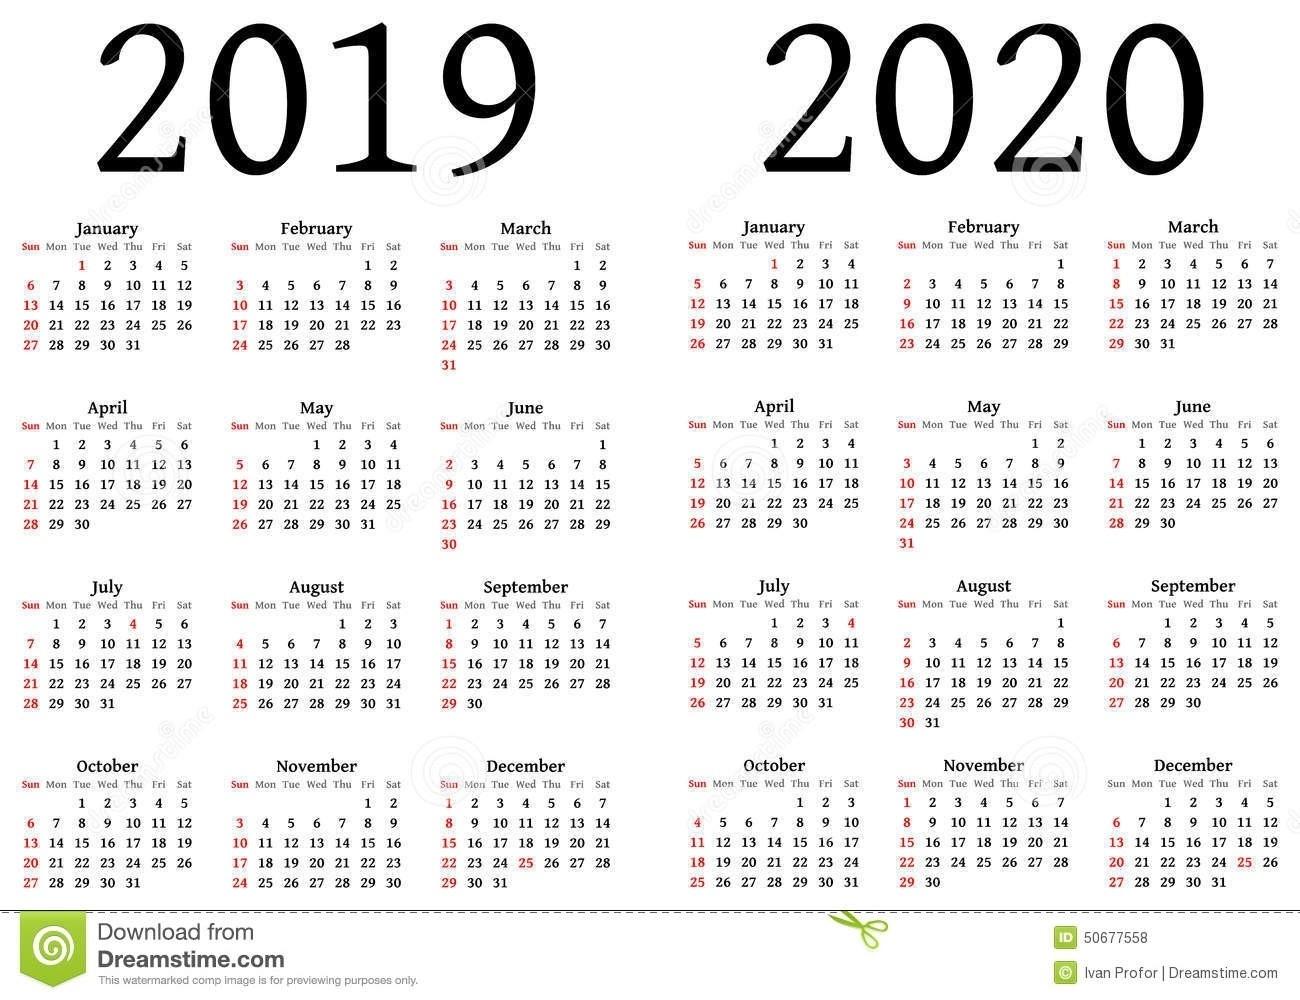 Large Calendar 2019/2020 - Calendar Inspiration Design  Depo-Provera Calendar 2020 2021